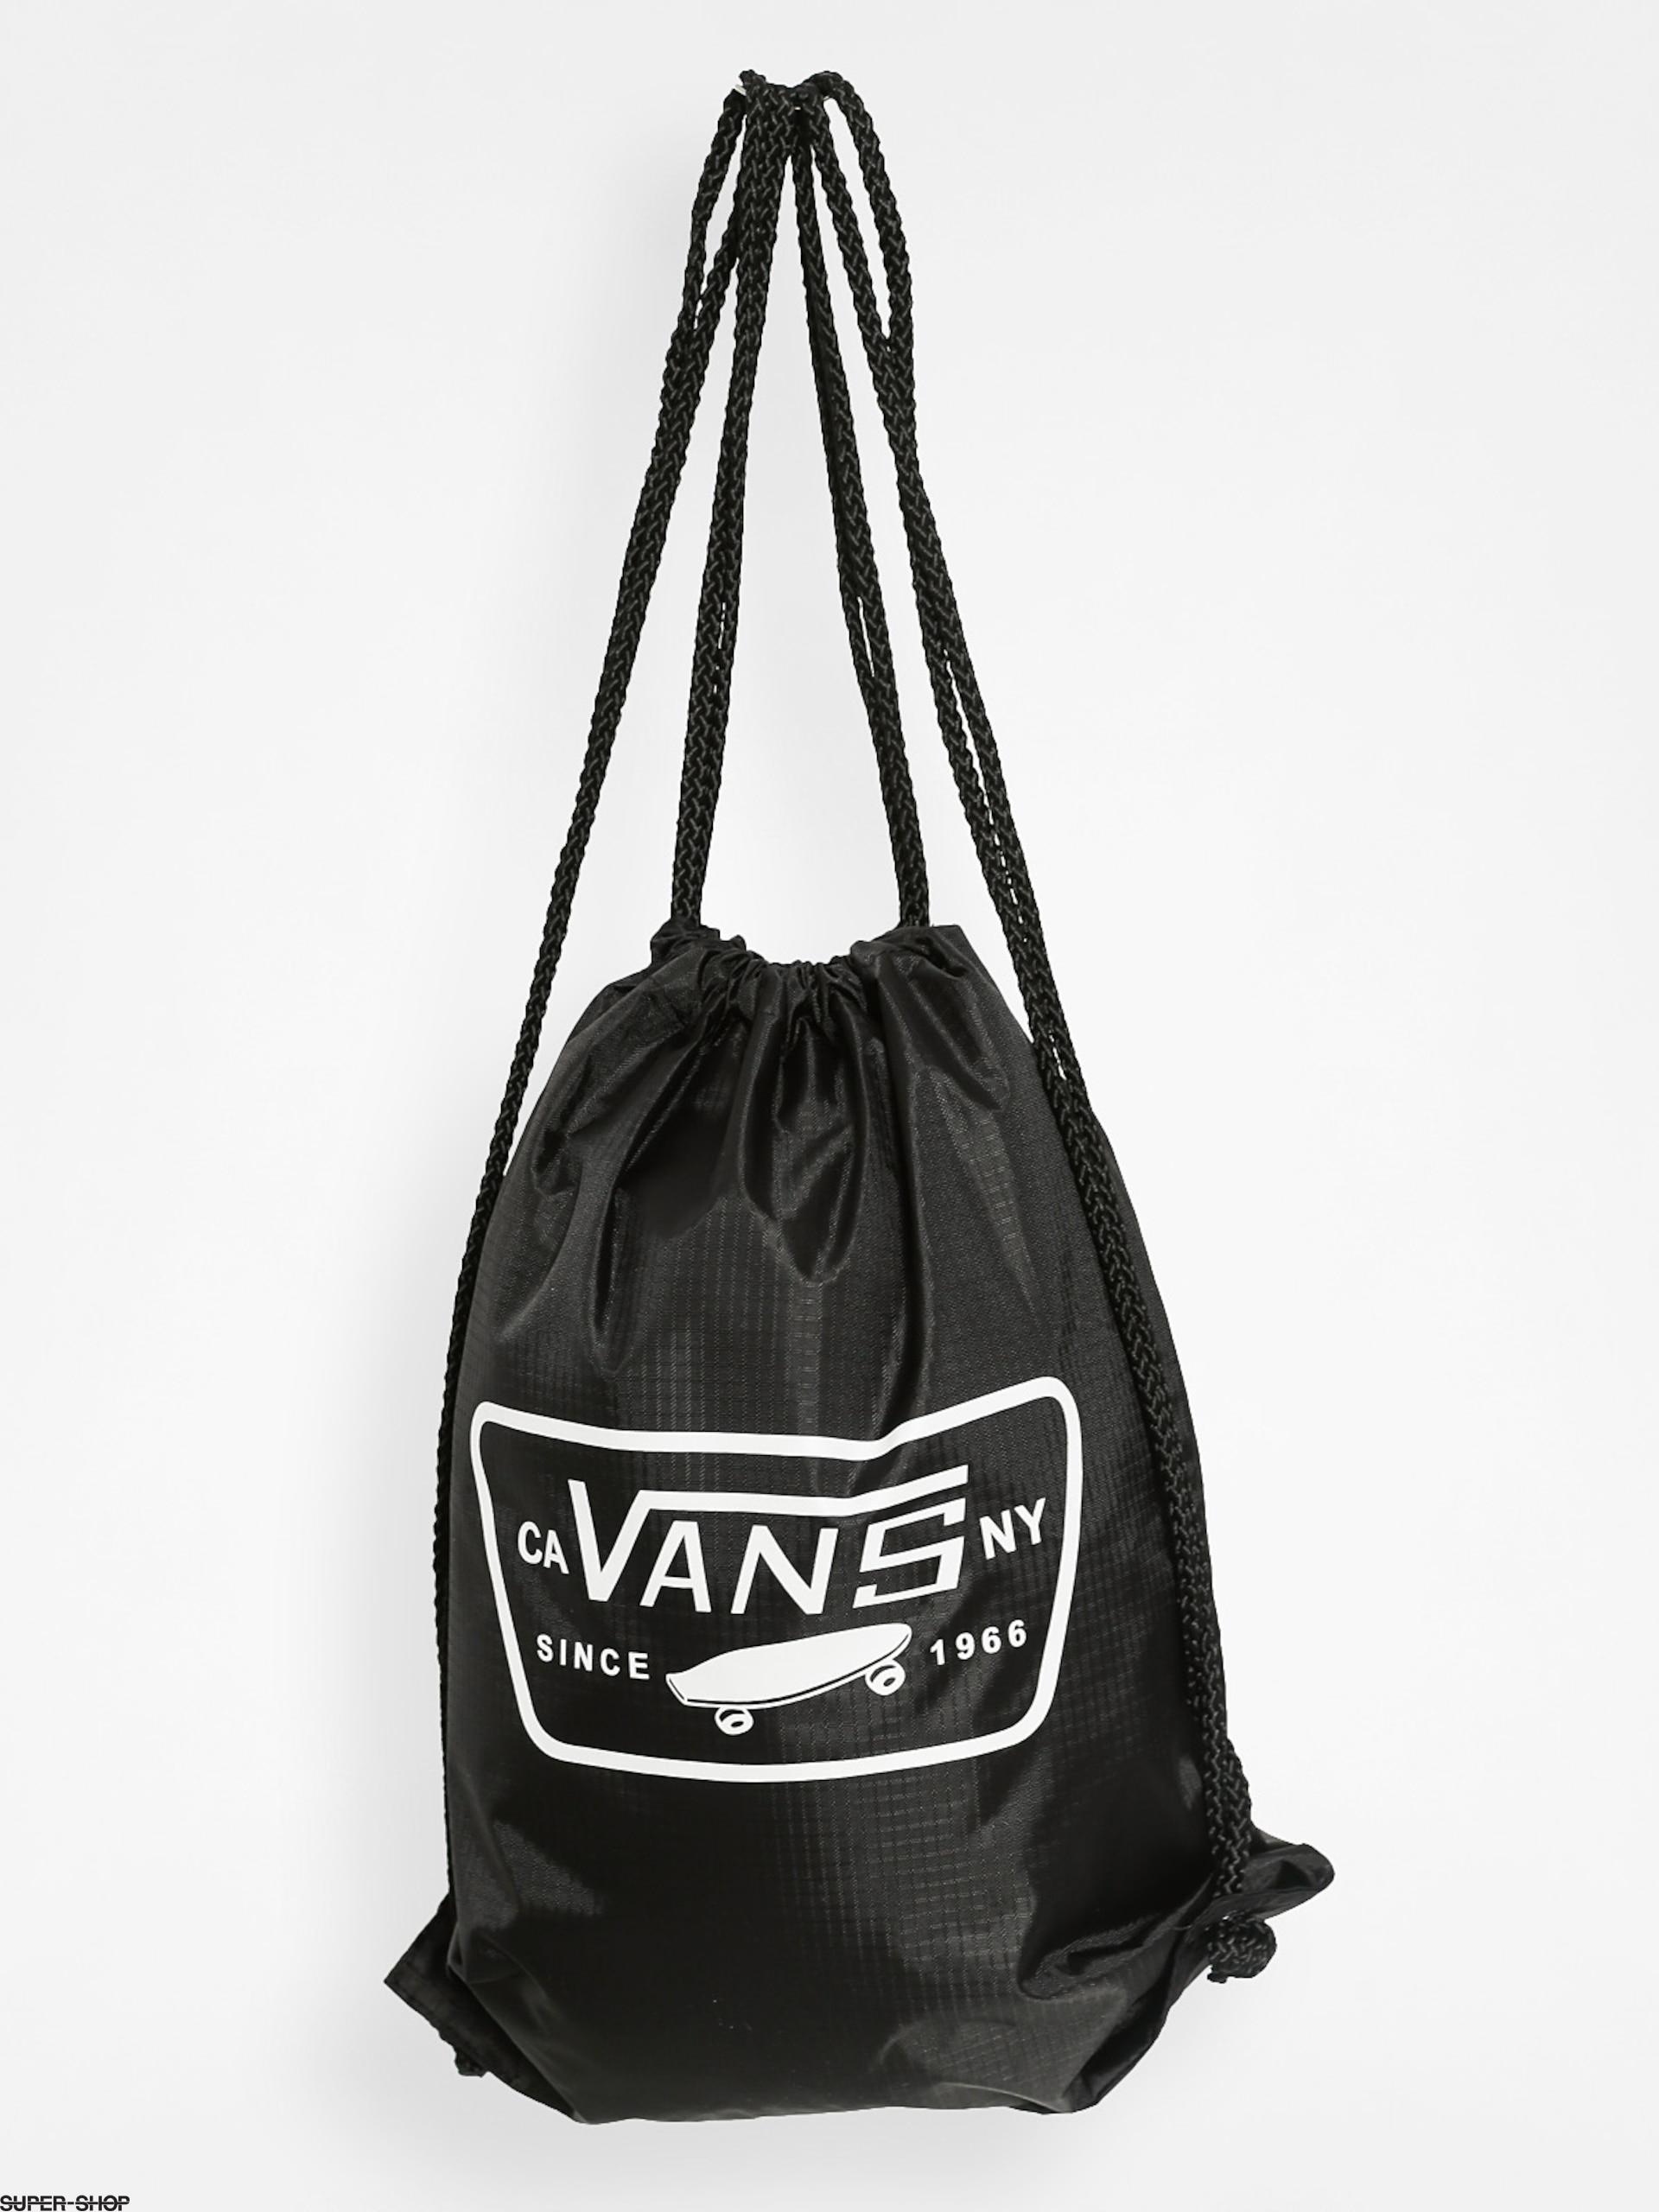 11a6e33658 835192-w1920-vans-backpack-league-bench-bag-black-white.jpg